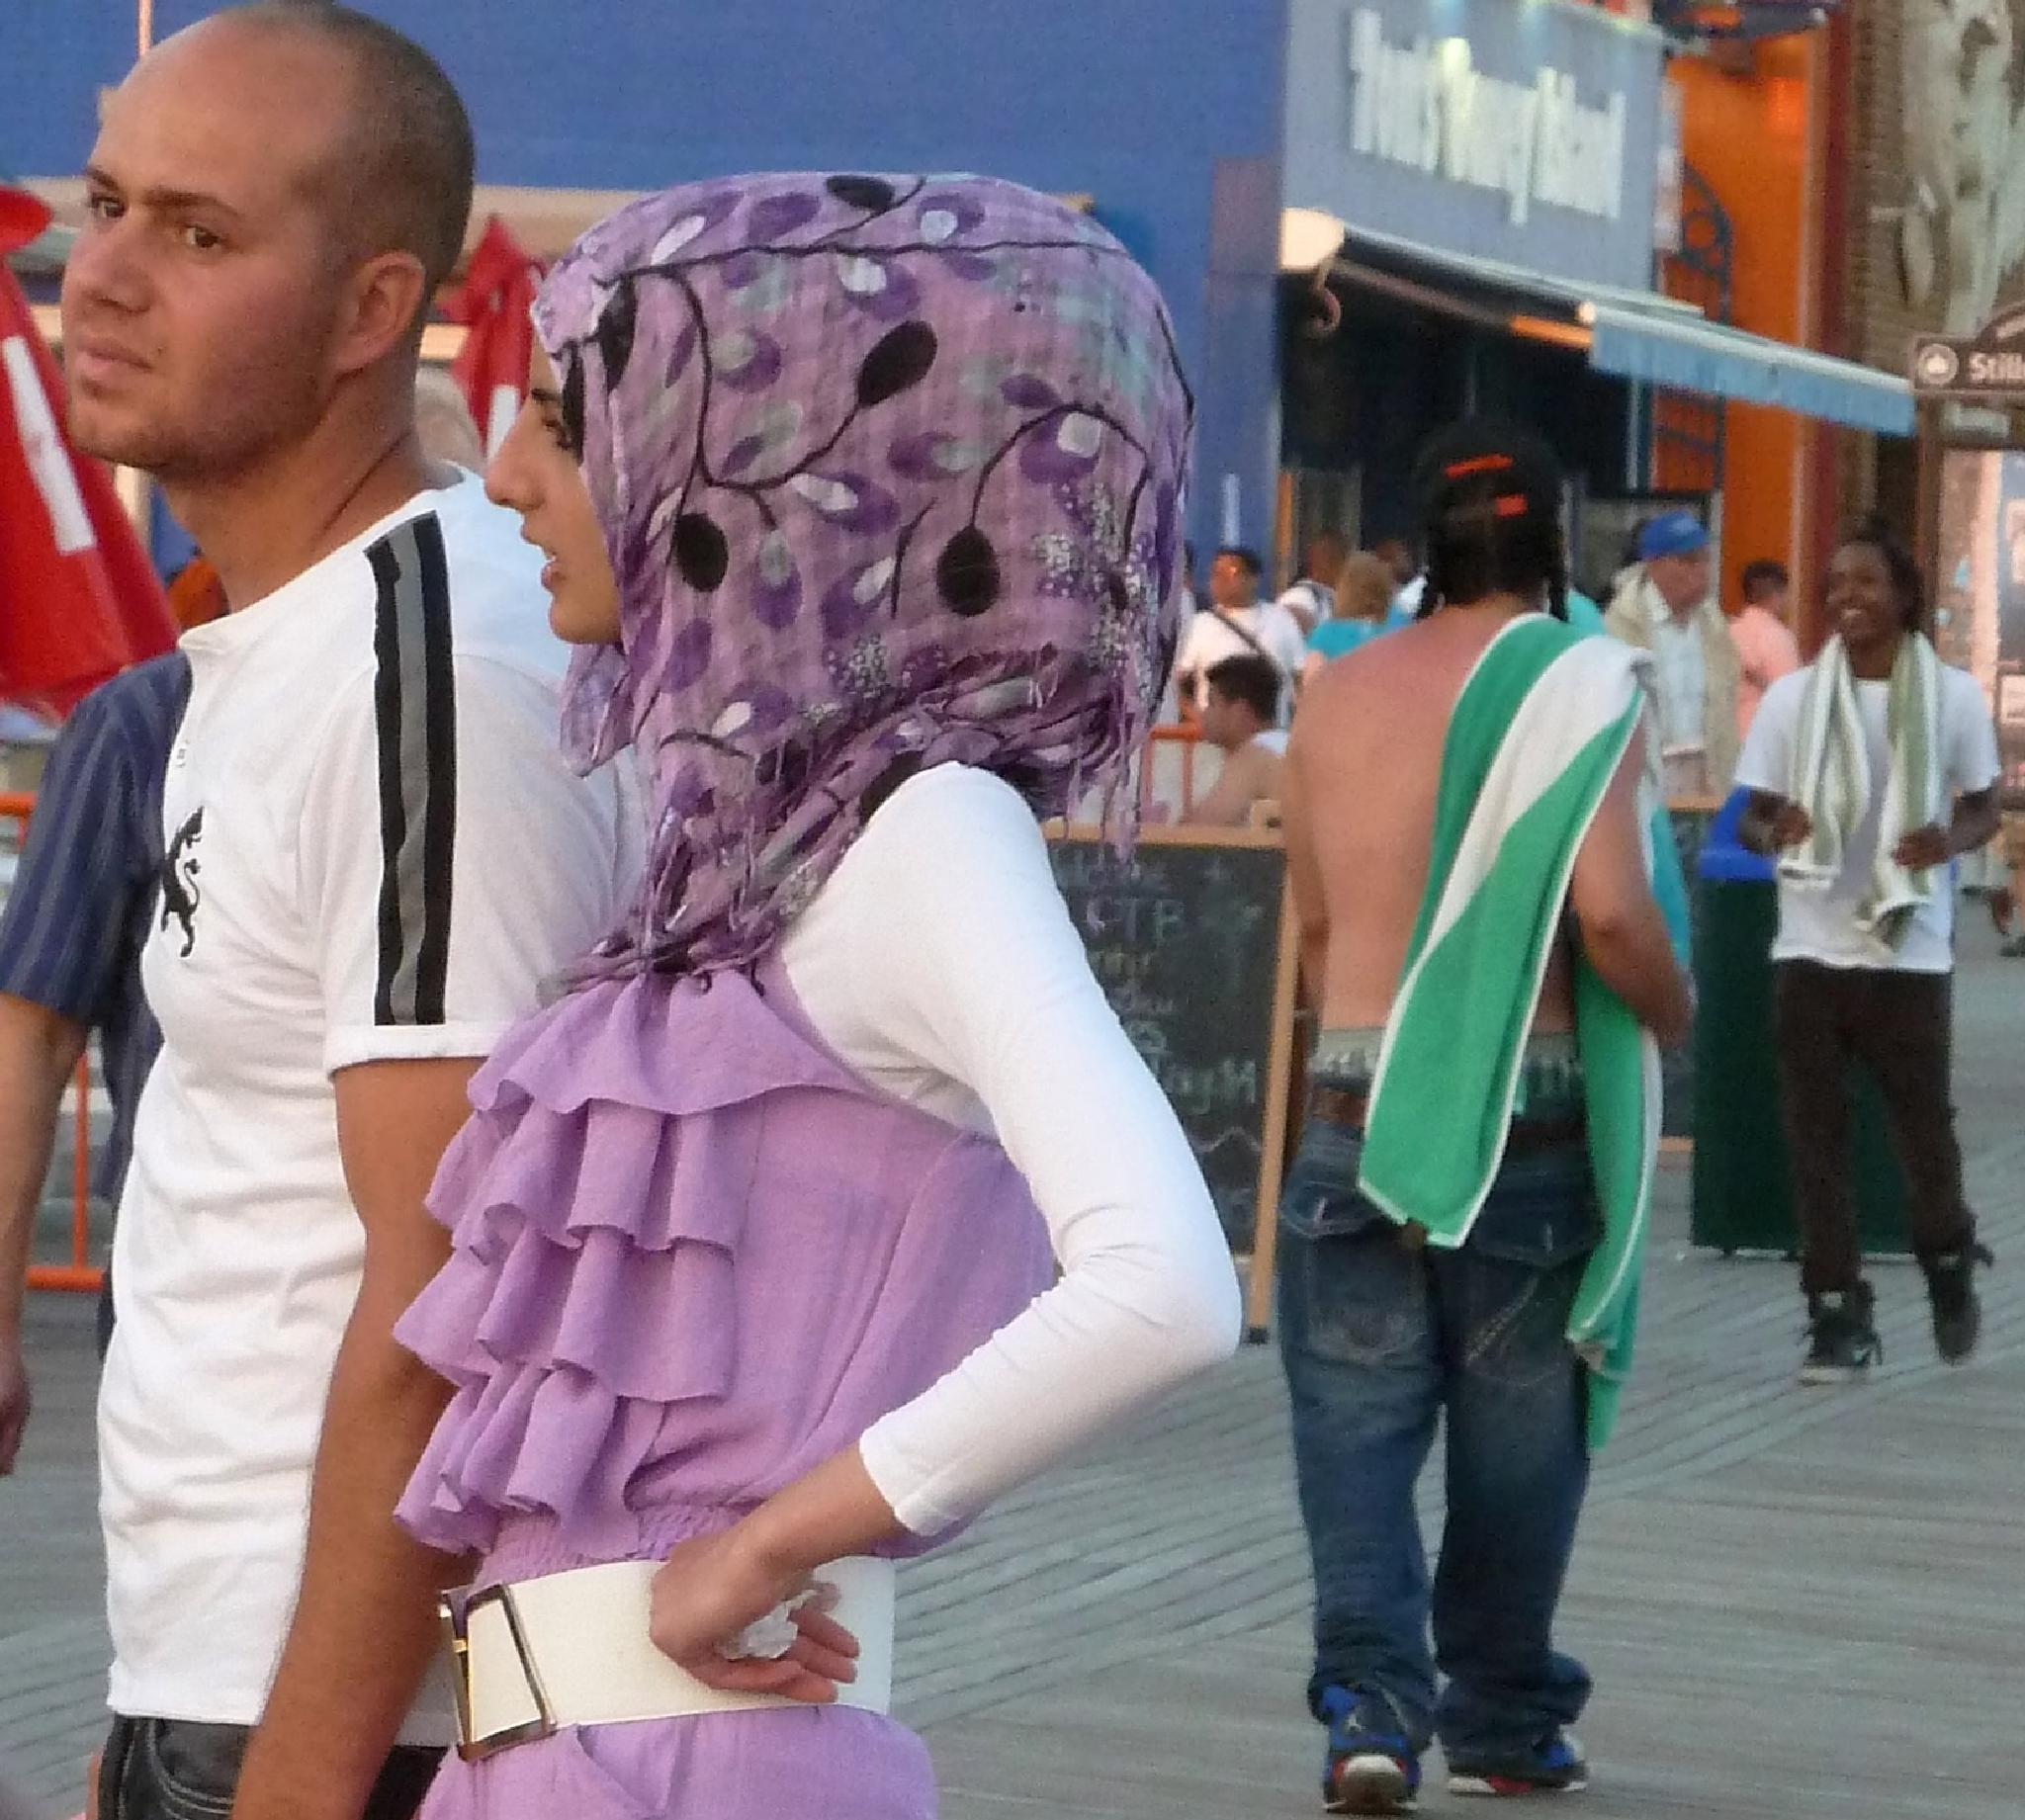 Coney Island Catwalk. Leisurewear for men and women. by Anton Agalbato